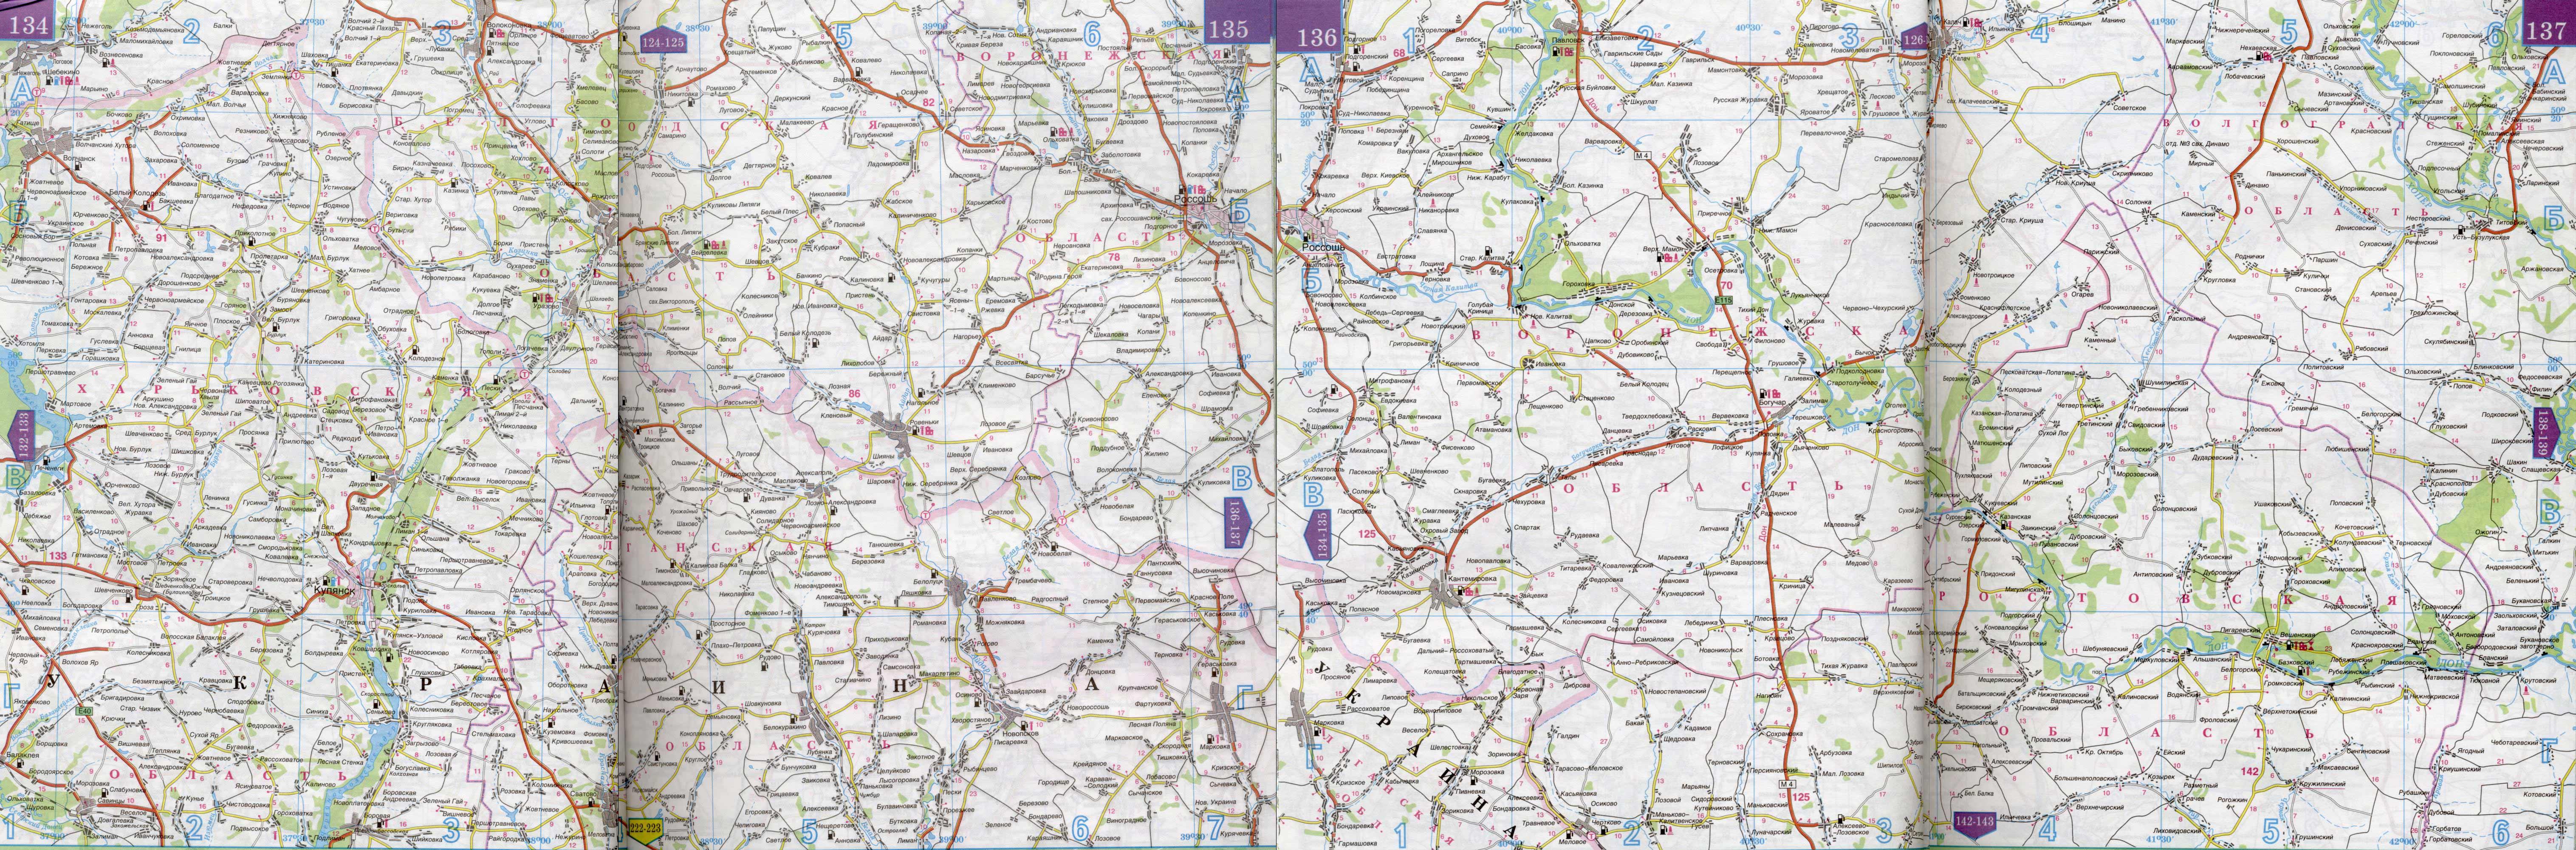 Карта автодорог Воронежской области | #161 | Воронежская ...: http://russia.at.ua/blog/karta_dorog_voronezhskoj_oblasti/2009-10-05-161